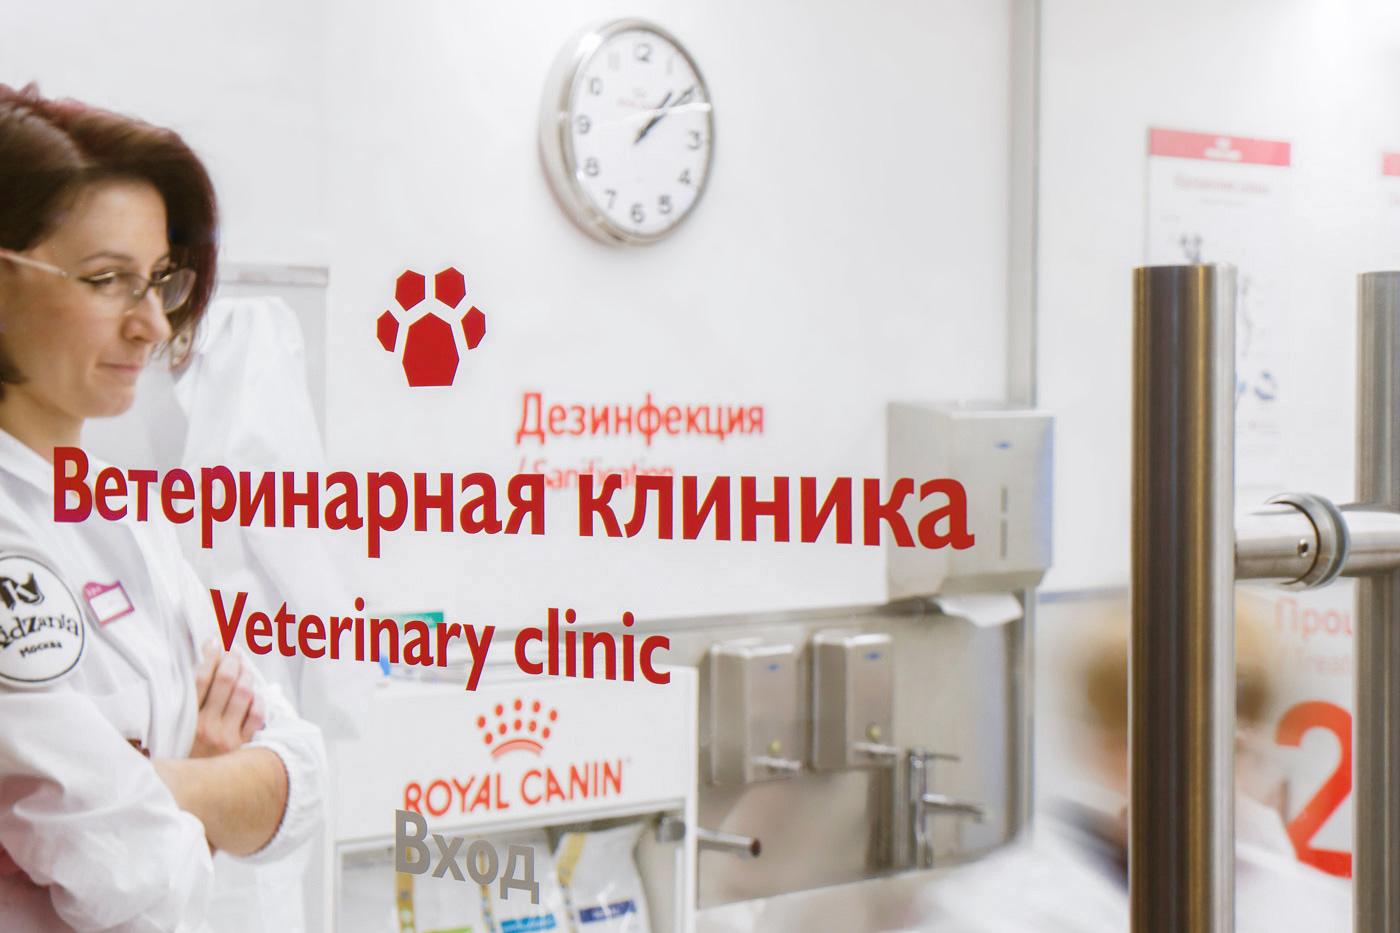 justbenice-kidzania-veterinaryclinic-3-6.jpg